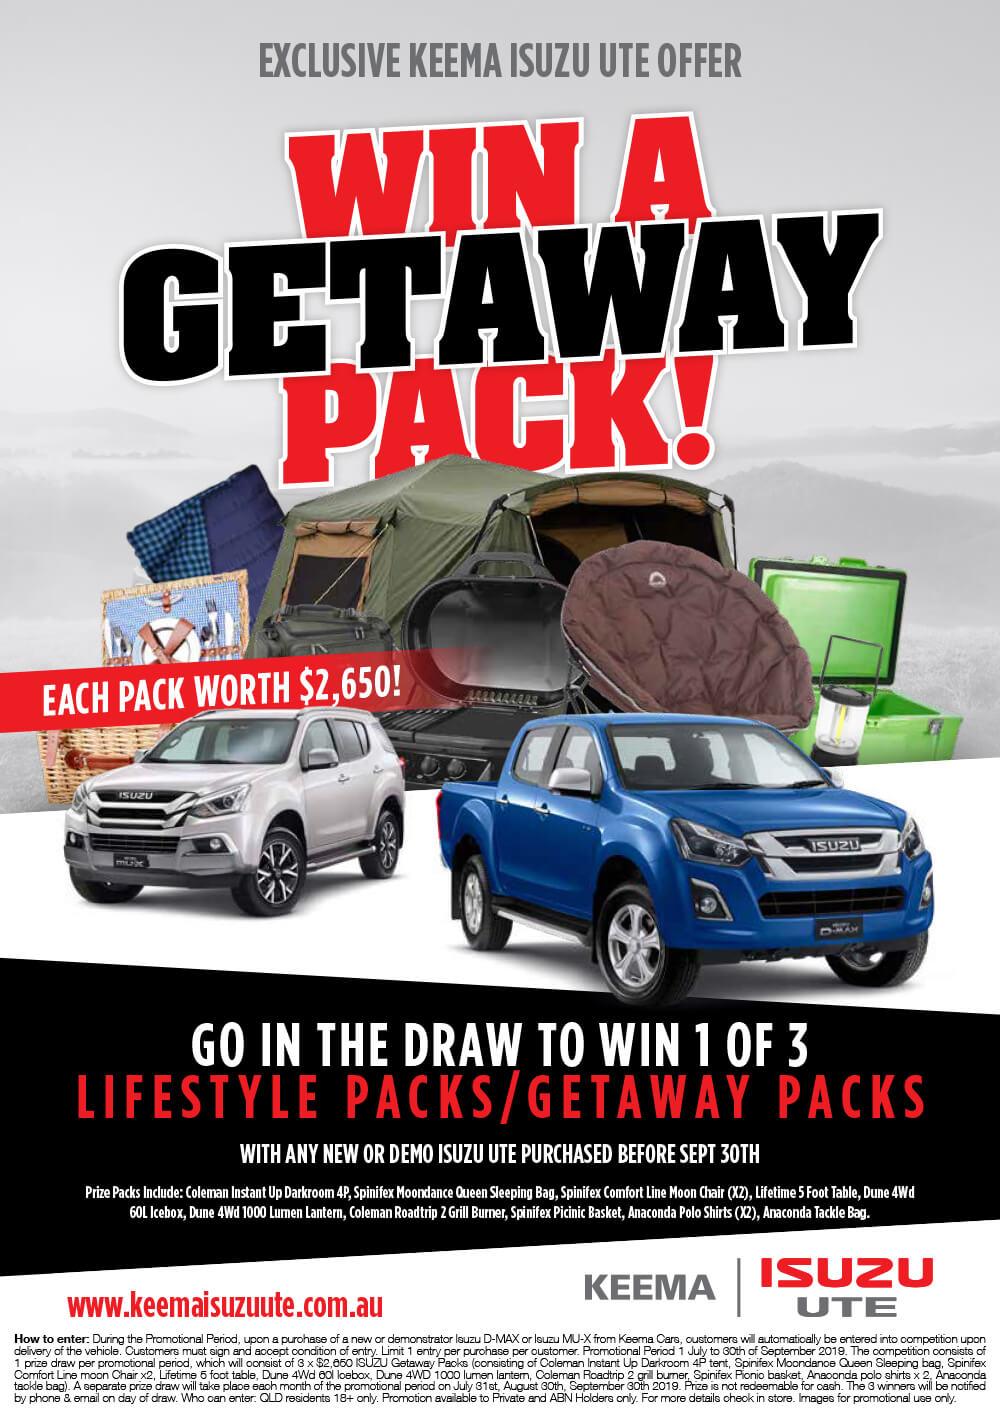 Win a Getaway Pack